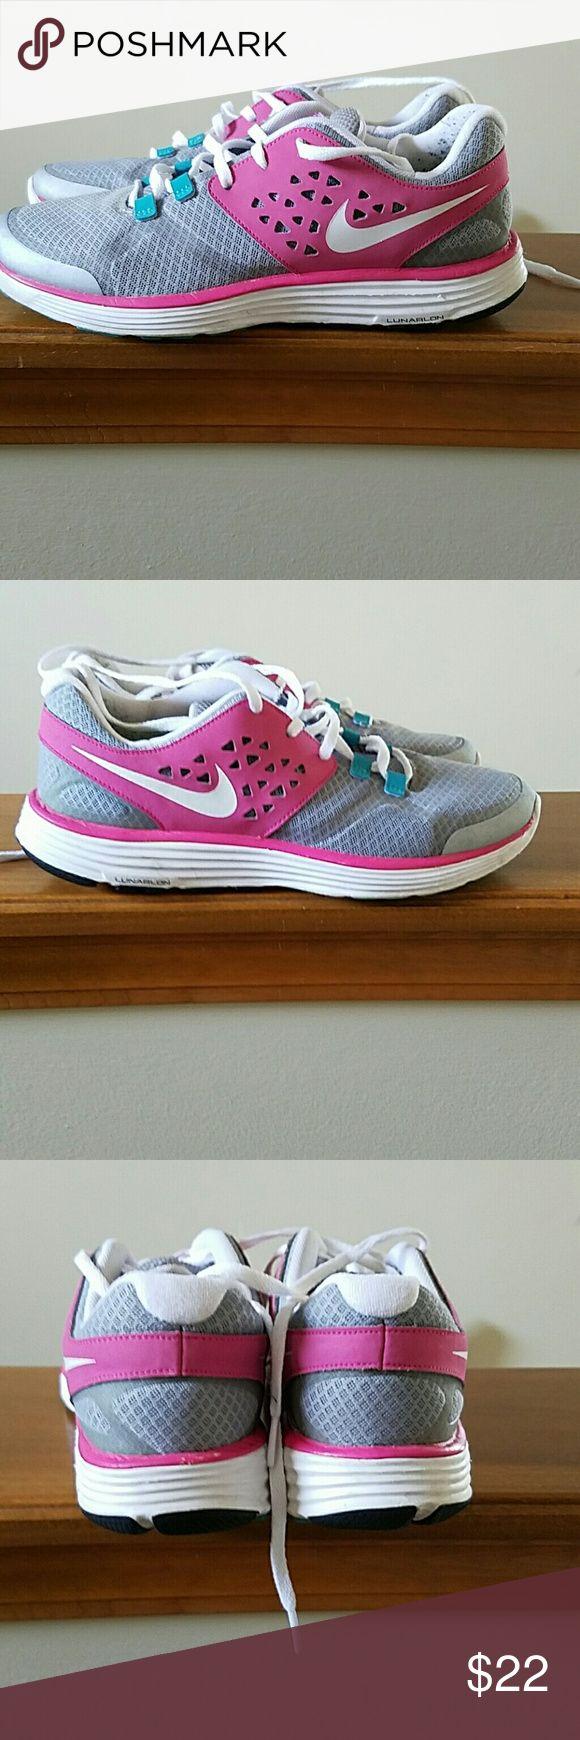 wholesale dealer 3f308 911e6 Air-Jordan-9-Retro-DB-GS-DOERNBECHER-Size- Nike ...